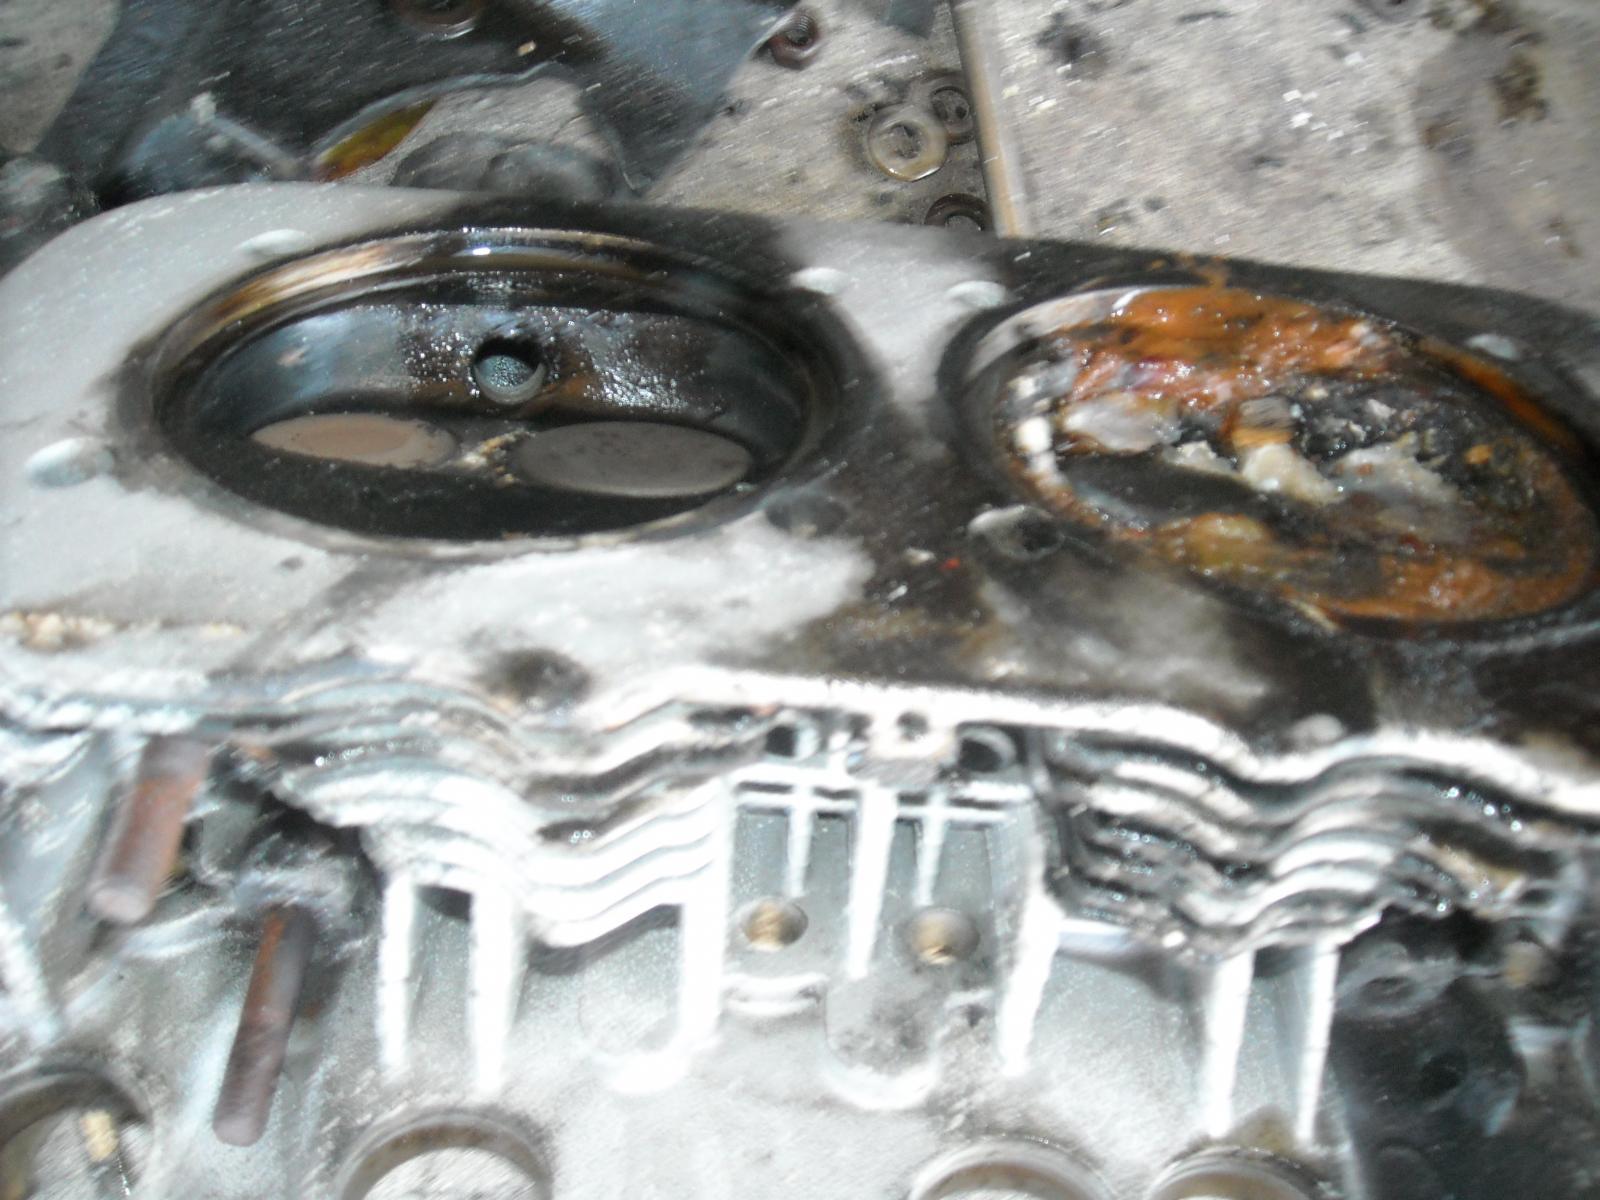 Burnt & Water-logged '76 2.0 F.I.